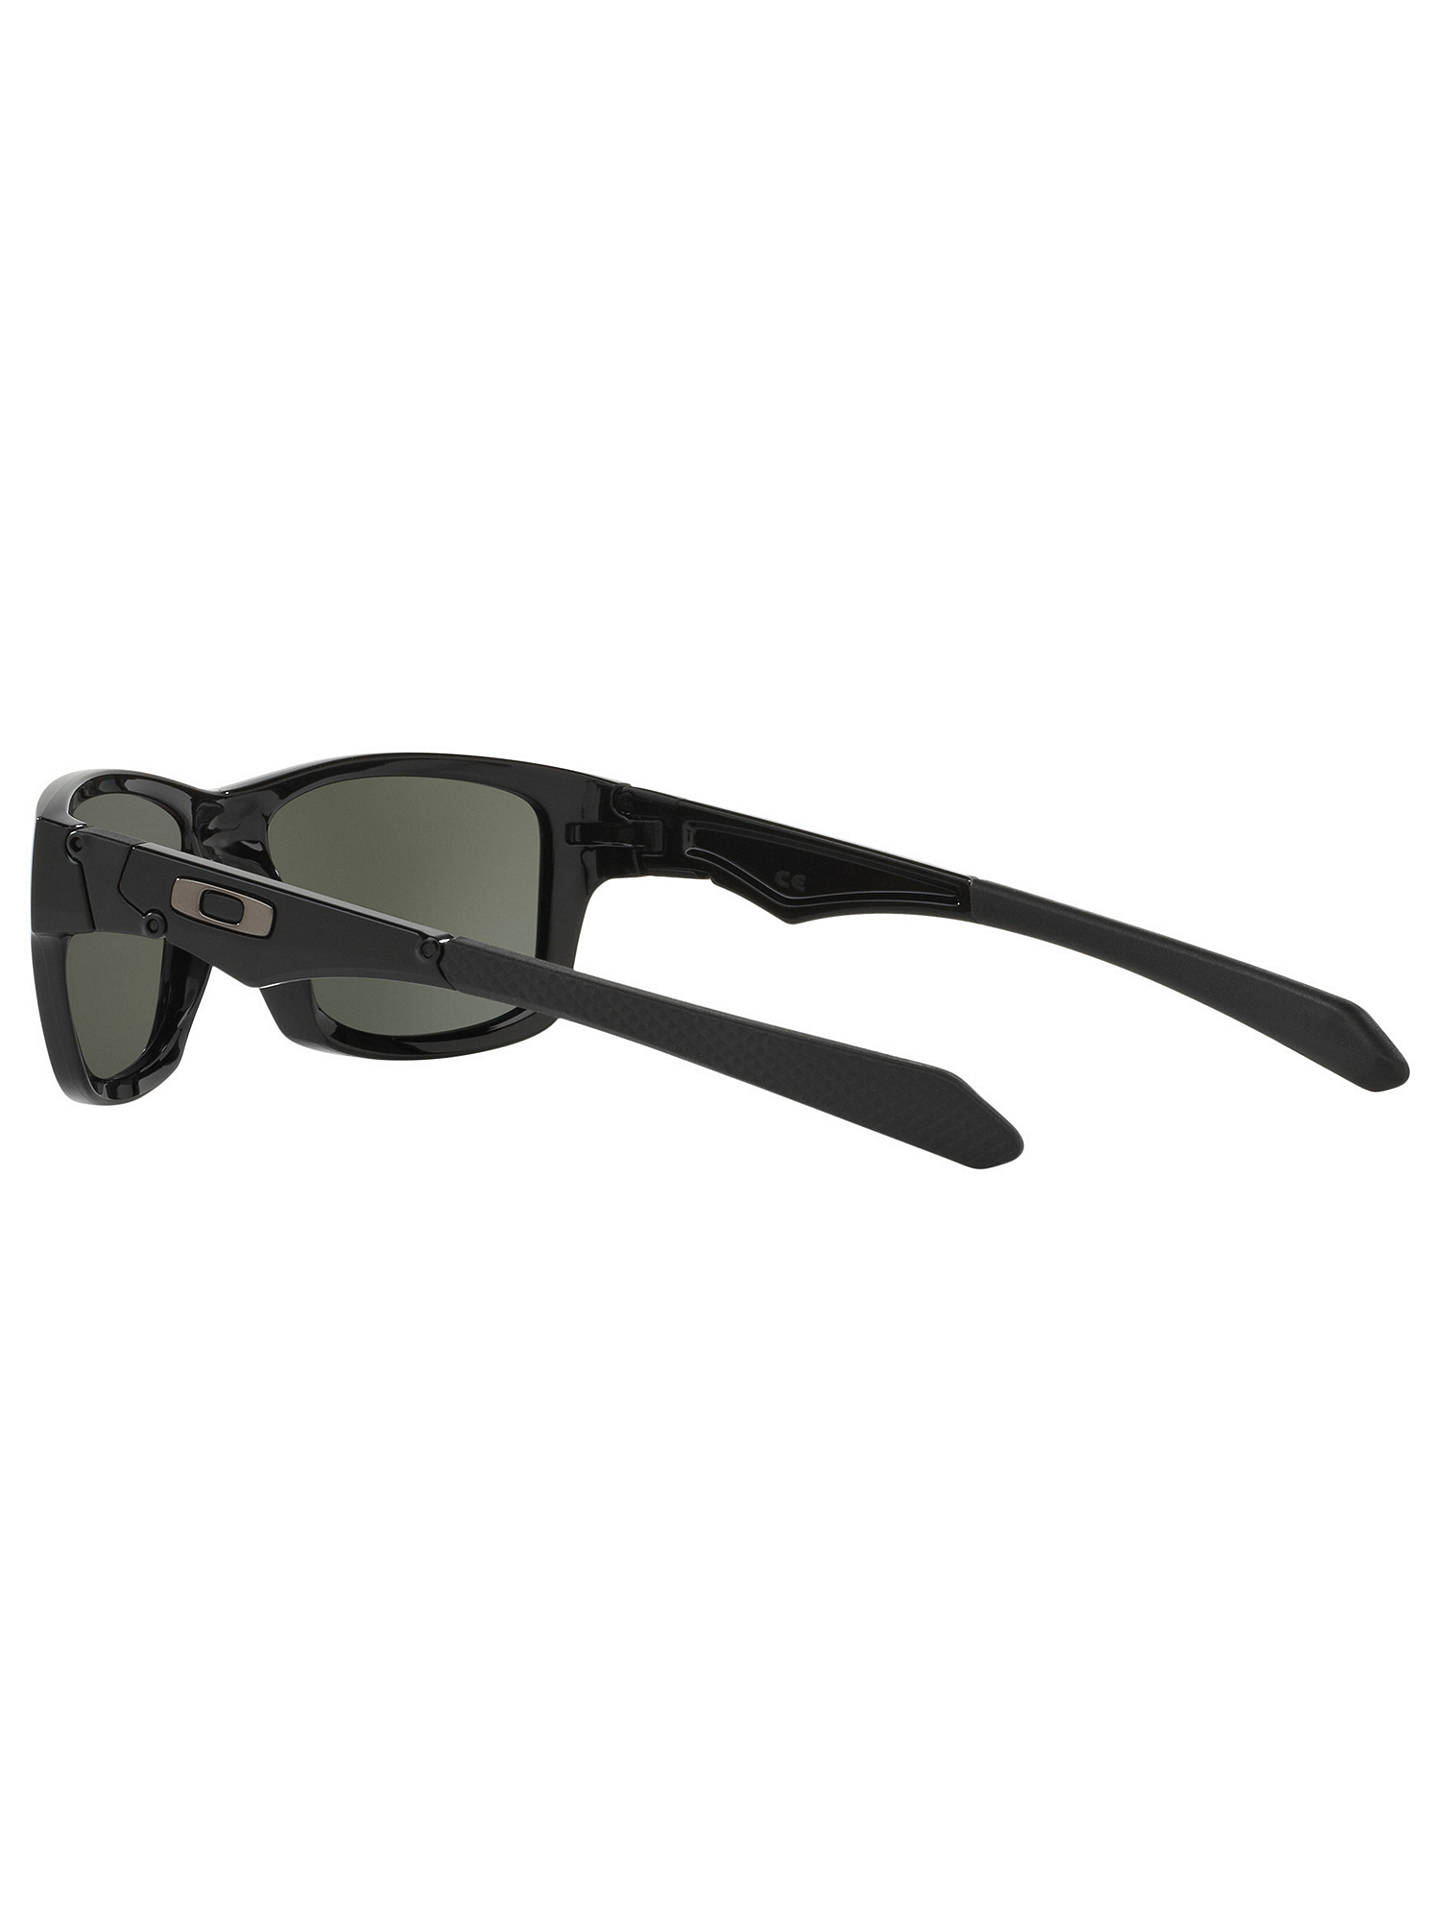 cc1860b38516f ebay oakley crossrange sunglasses 1baf7 75a55  cheap buyoakley oo9135  jupiter polarised square framed sunglasses black gloss mirror brown online  at ...